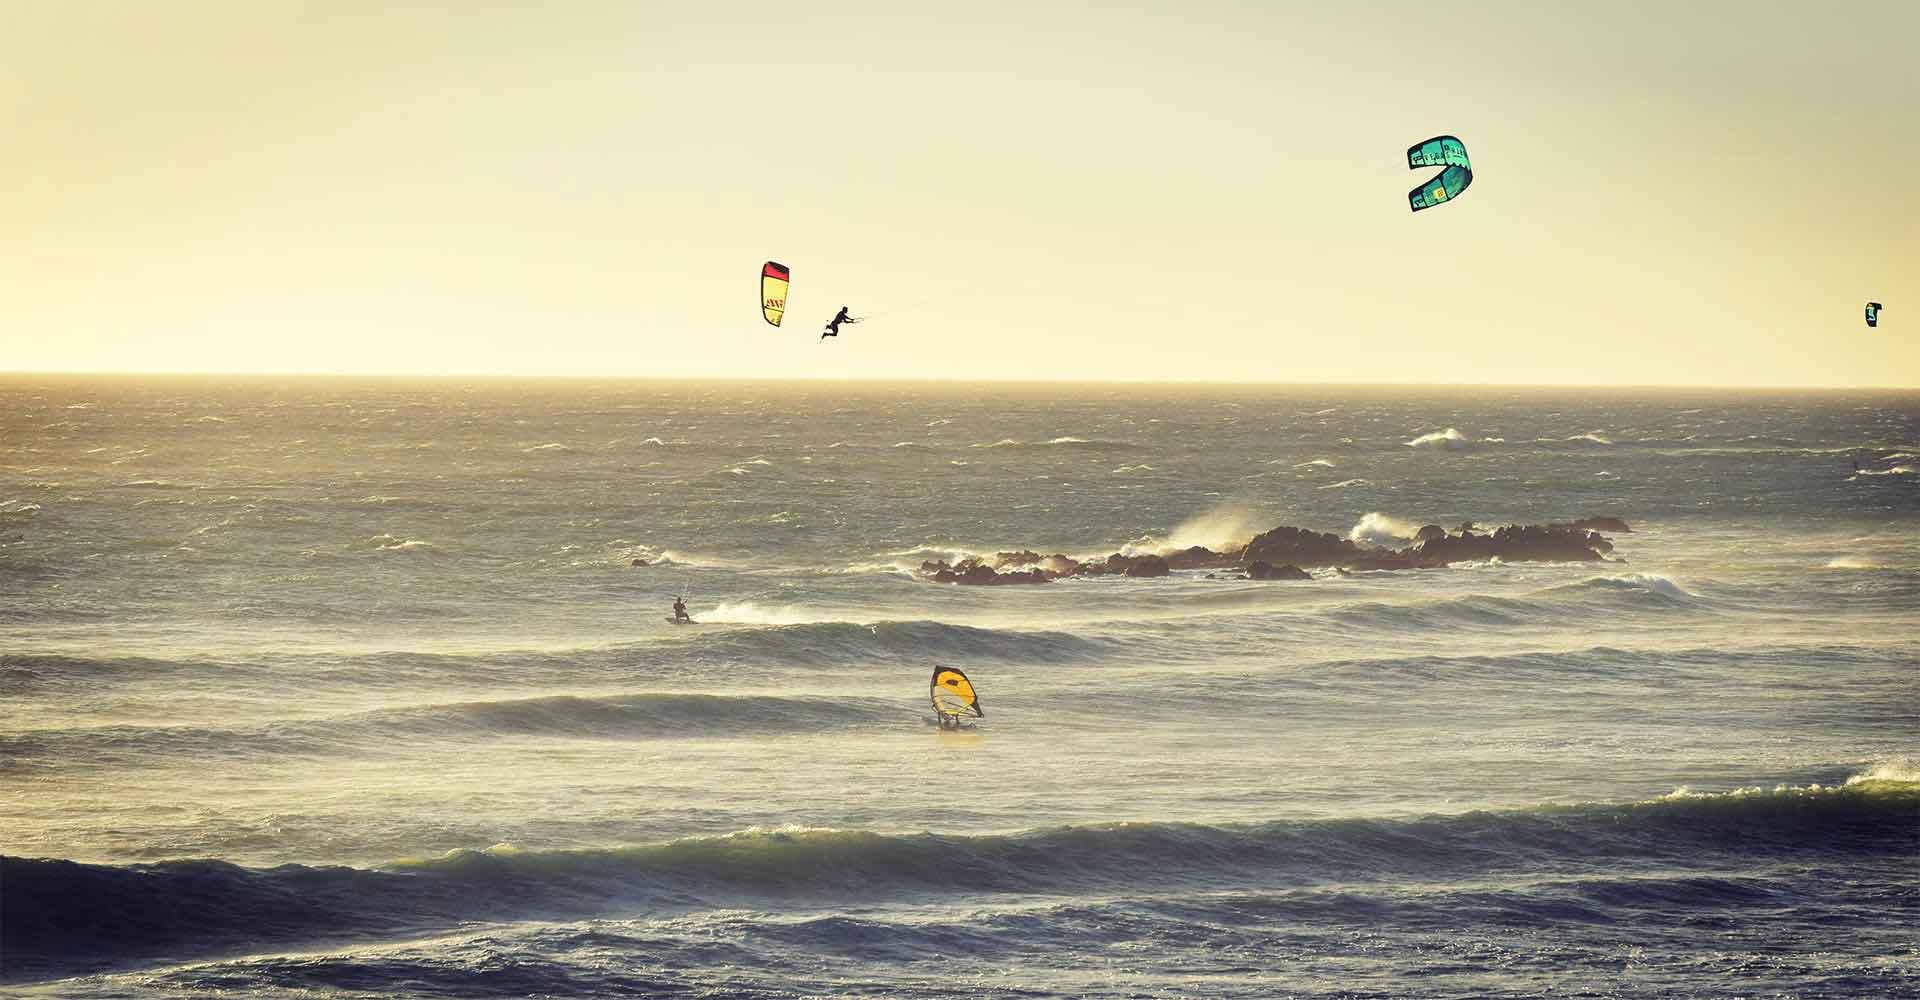 Gusty Kitesurfing School